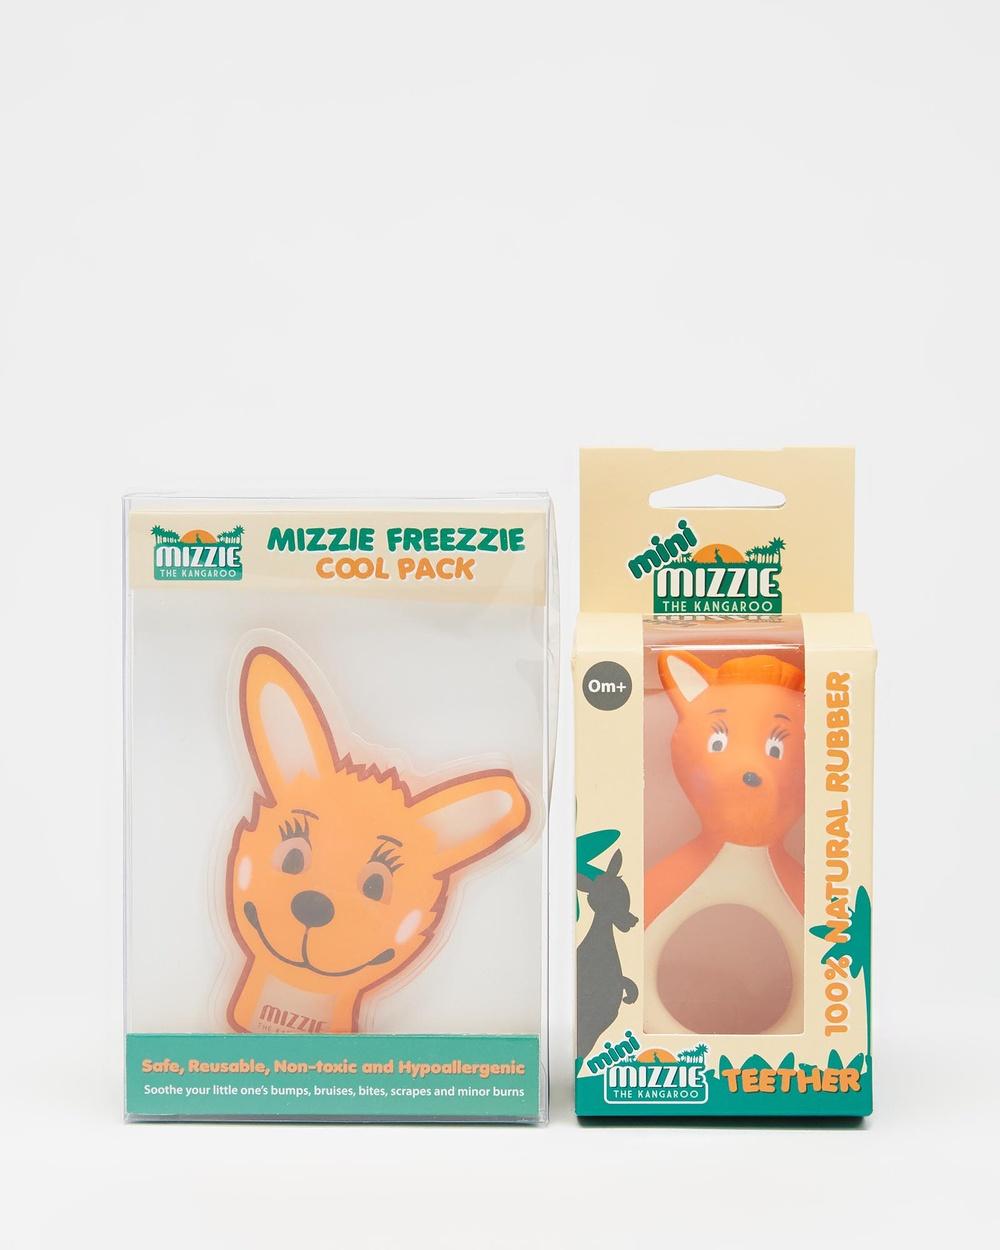 Mizzie The Kangaroo Mini Soothing Gift Set All toys Mizzie Freezzie Cool Pack All toys Australia